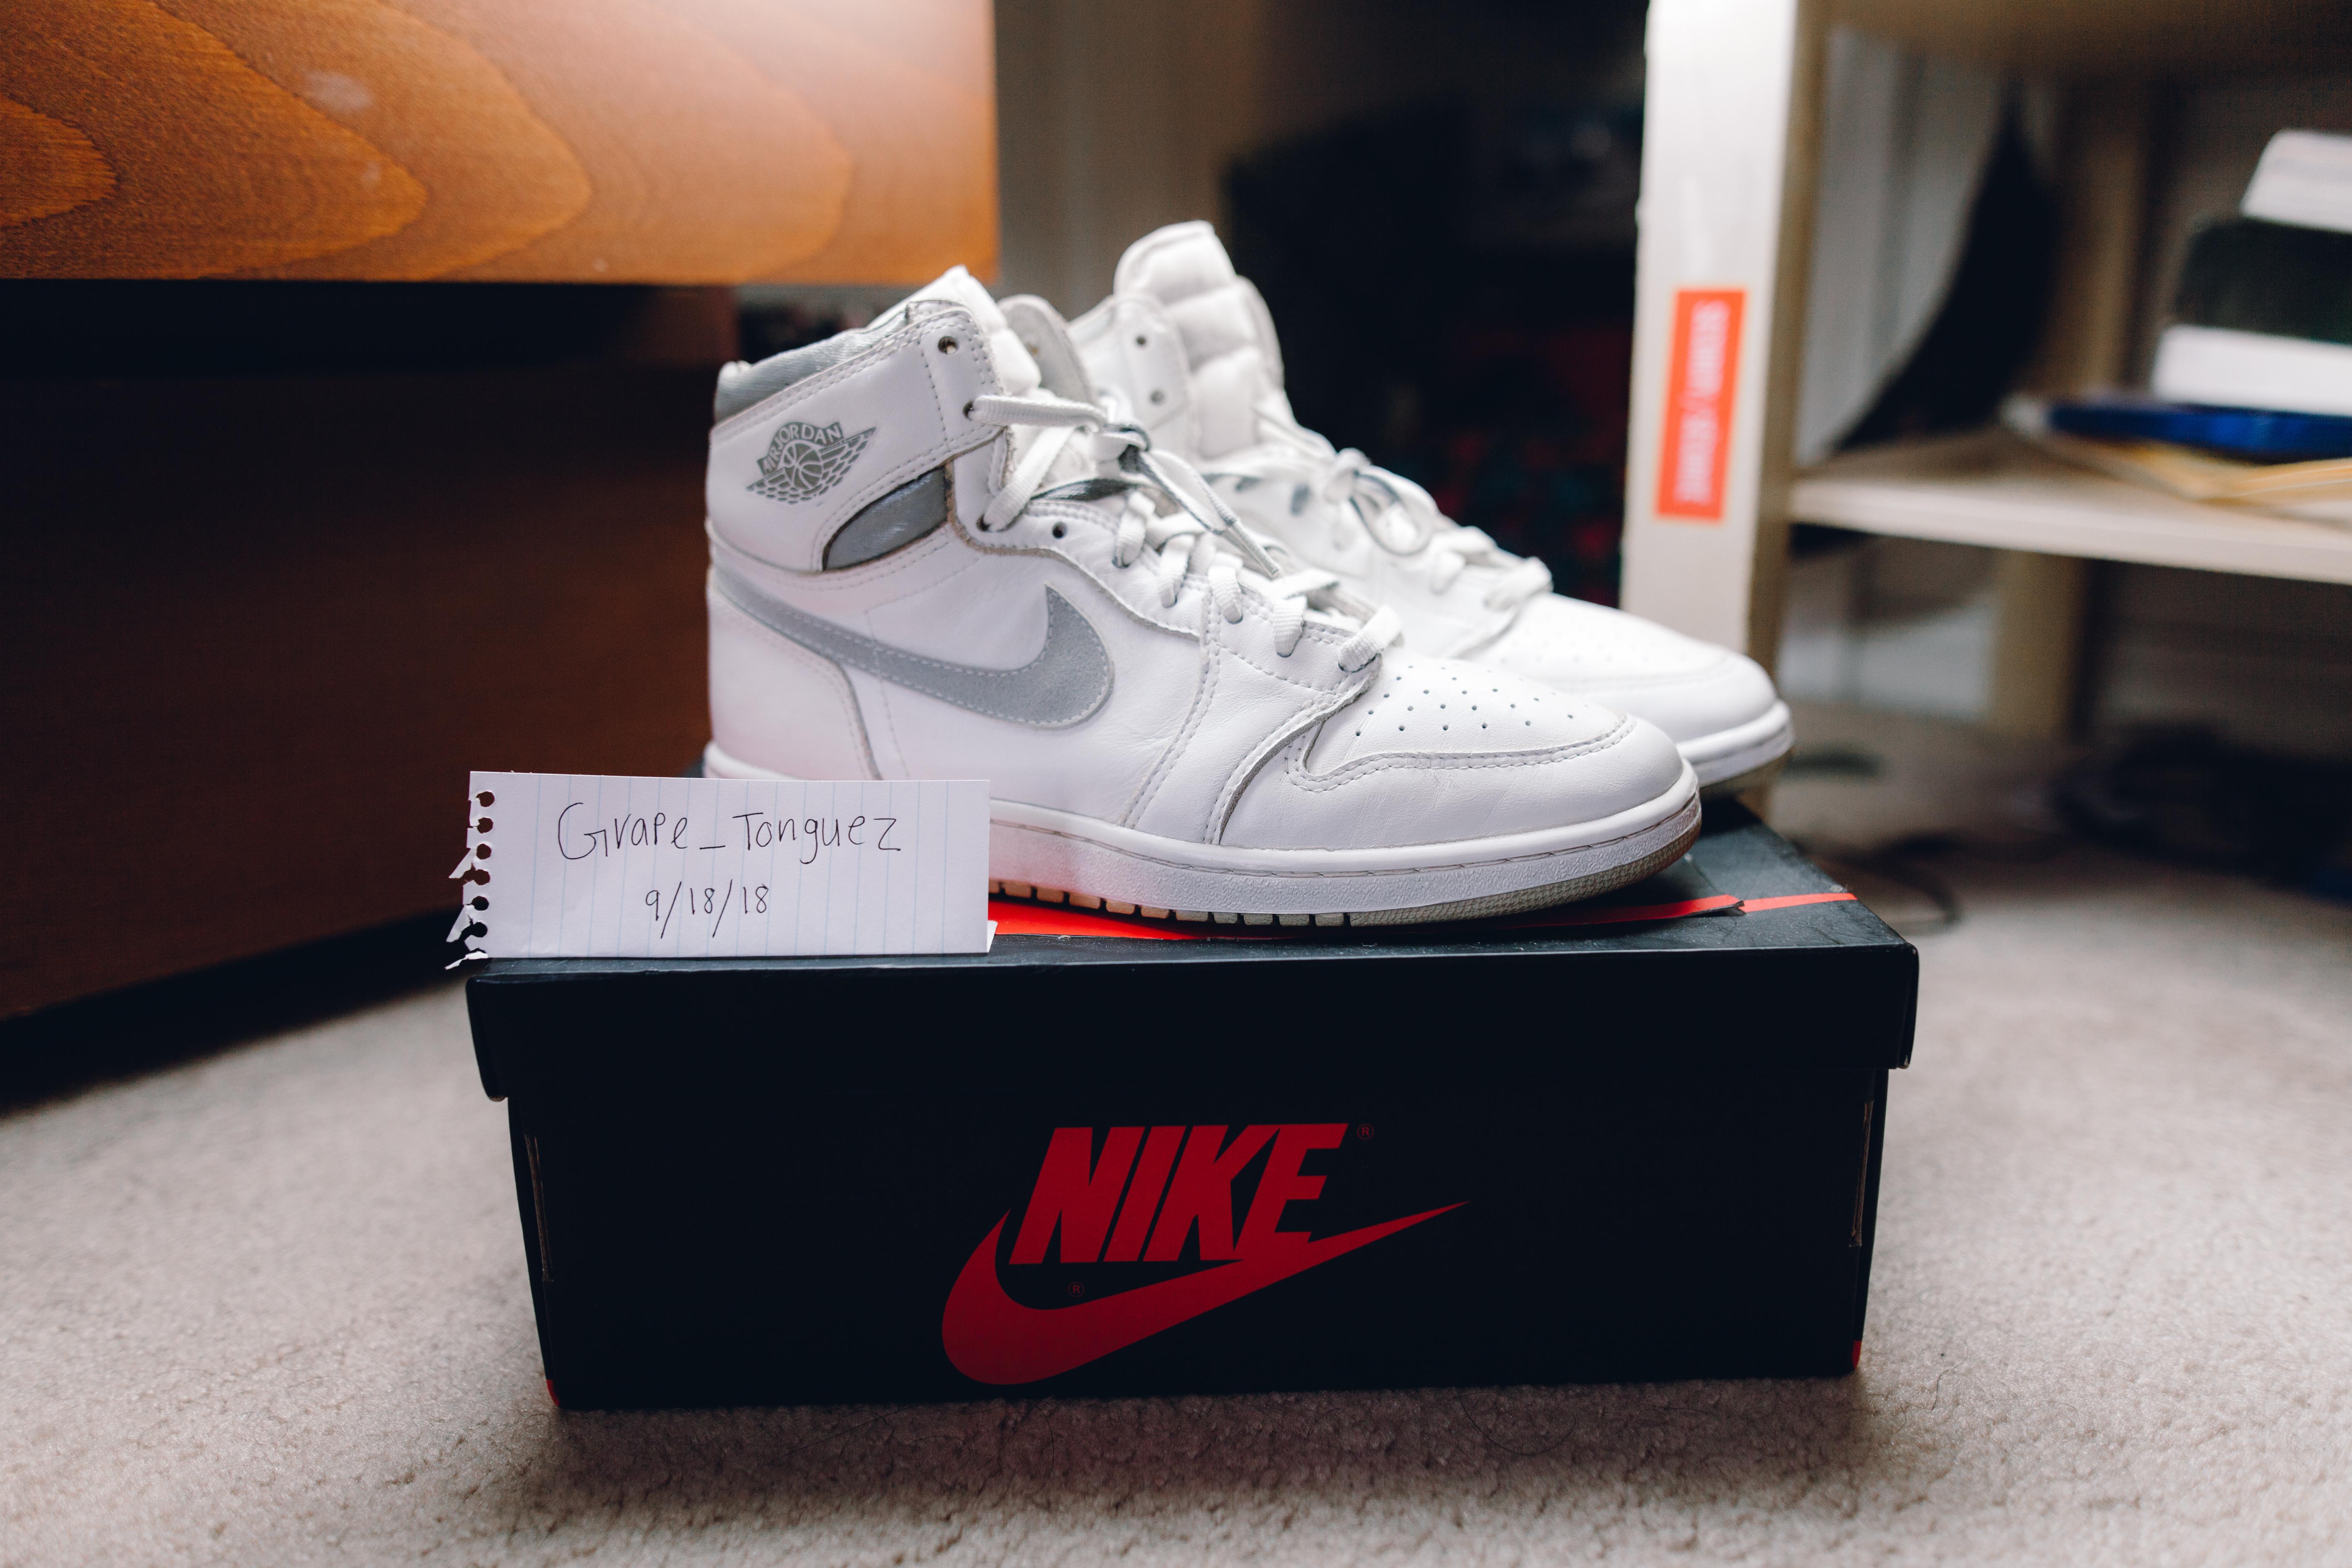 c111d0474fdfe5 Nike ×. Nike Air Jordan 1 1985 Neutral Grey OG